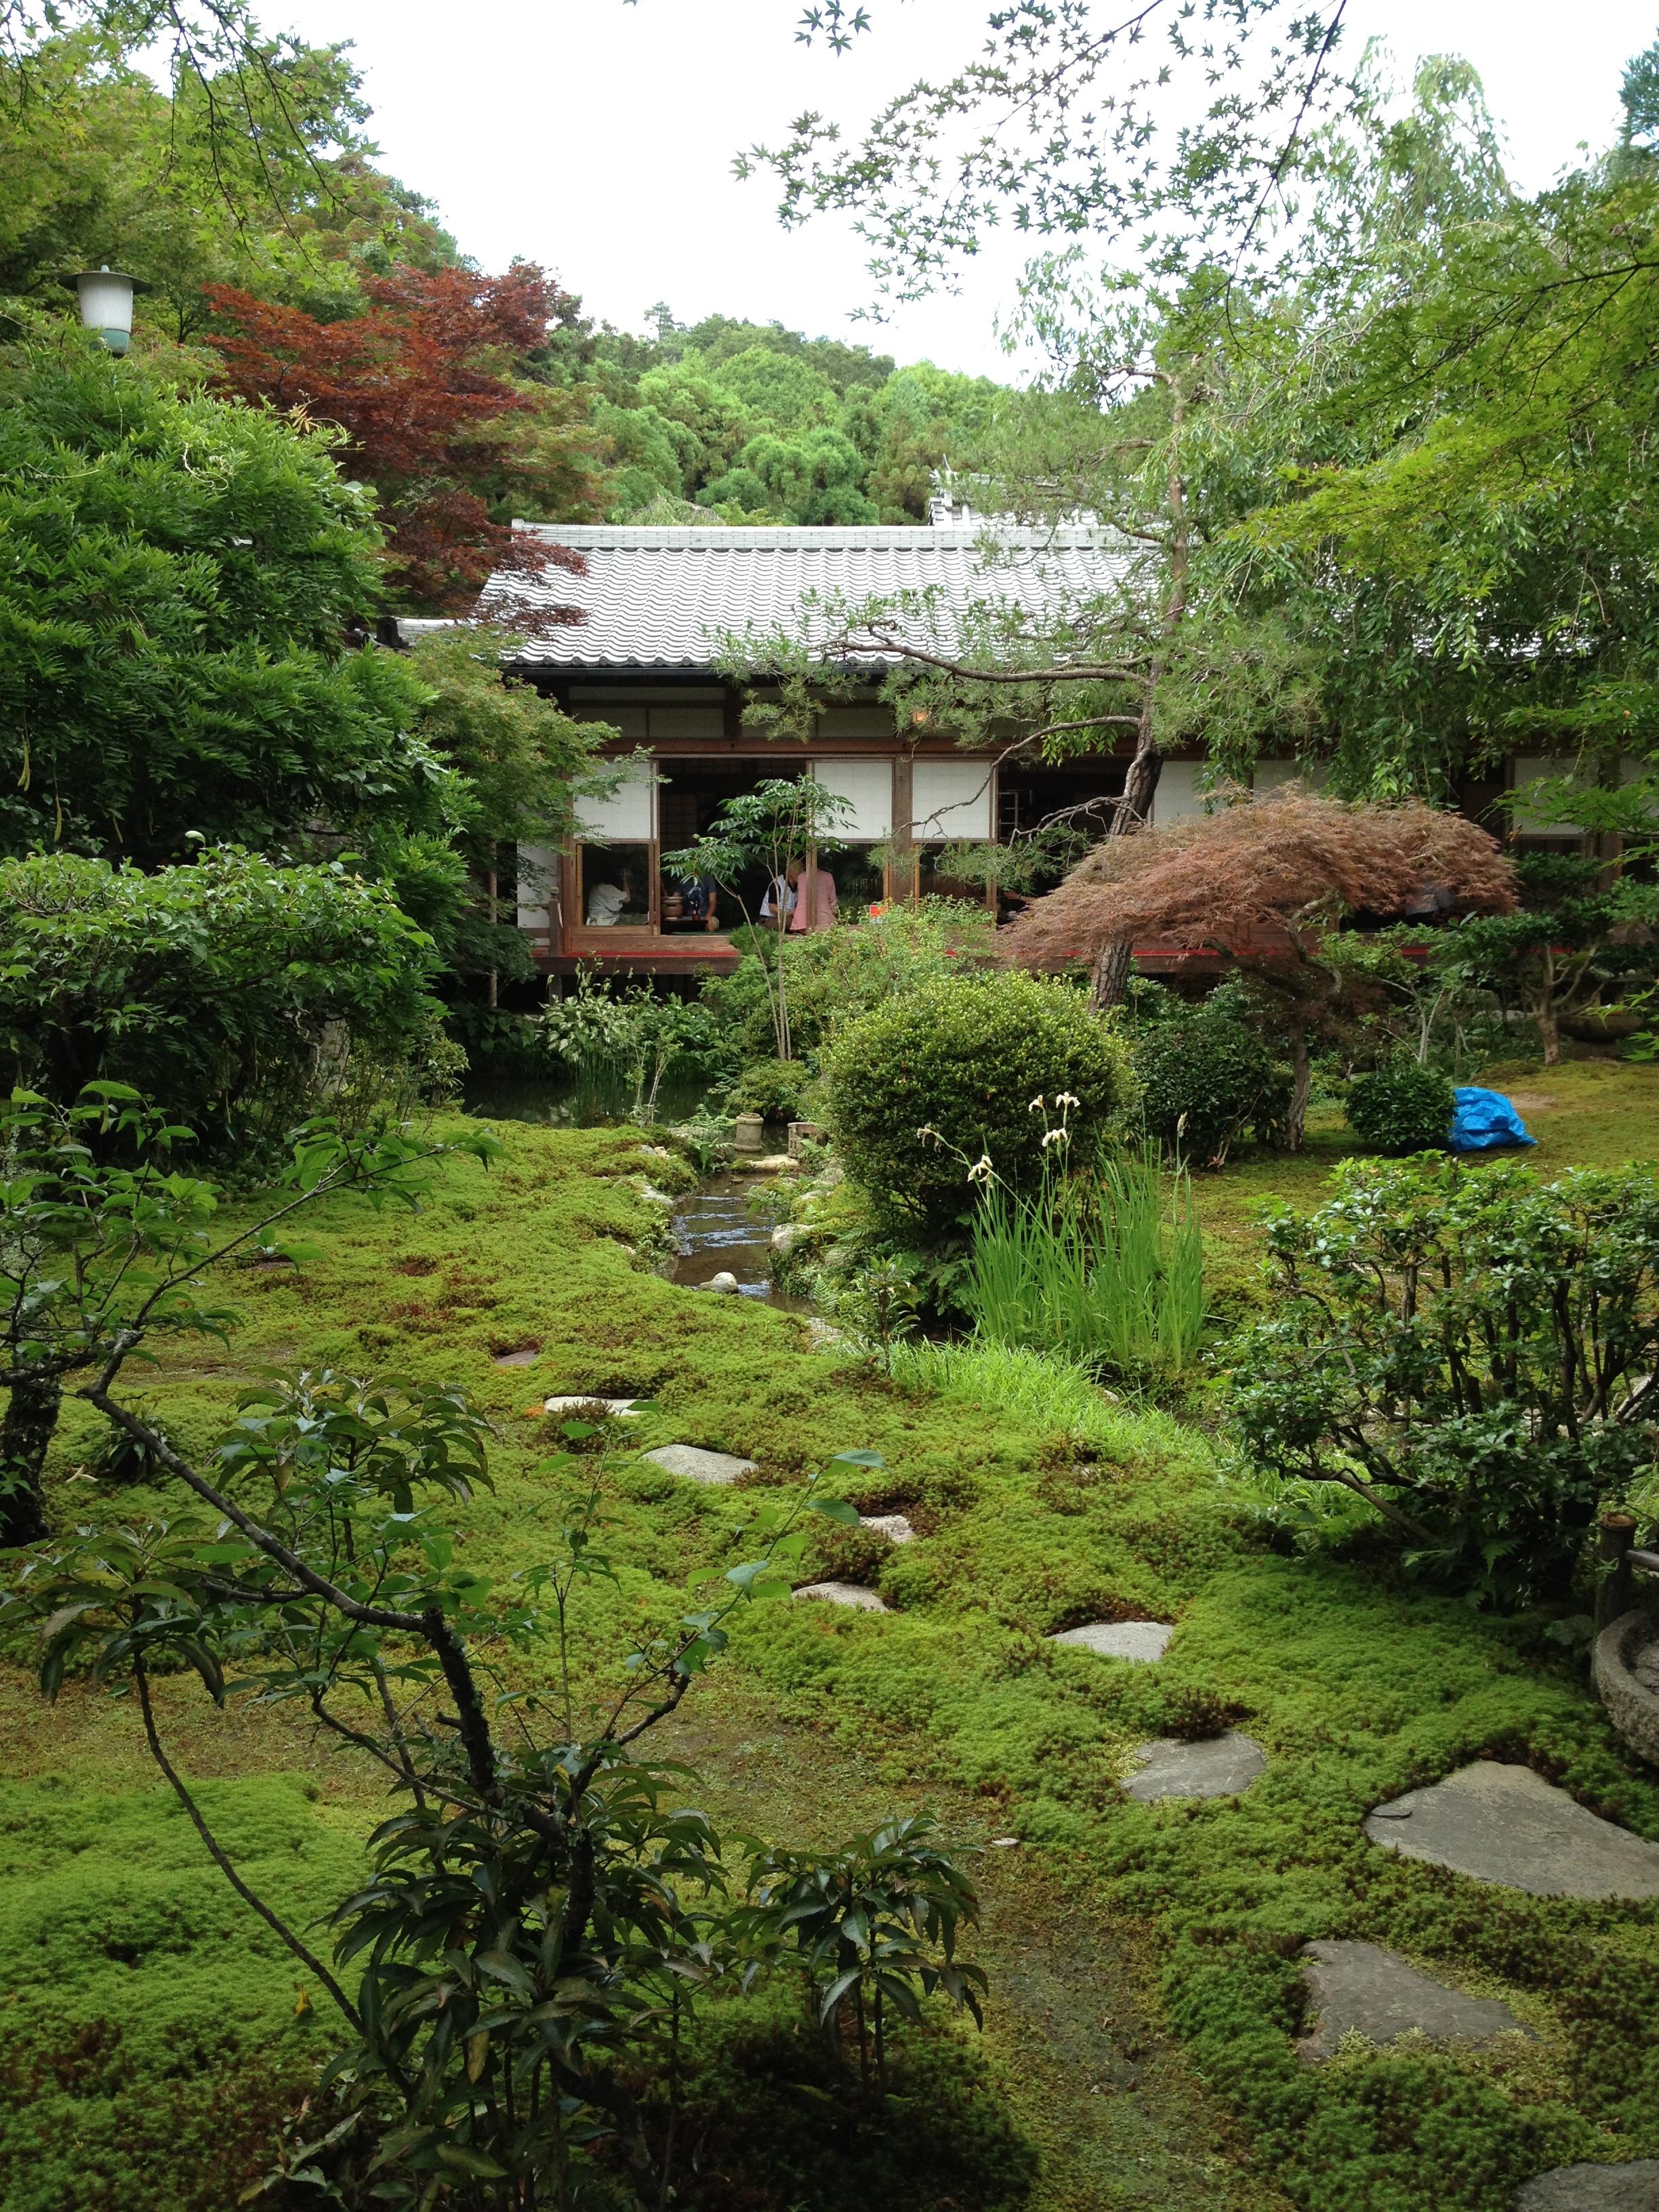 Yudofu Hot Pot- Ryoanji Yudofu In Ryoanji Temple Kyoto